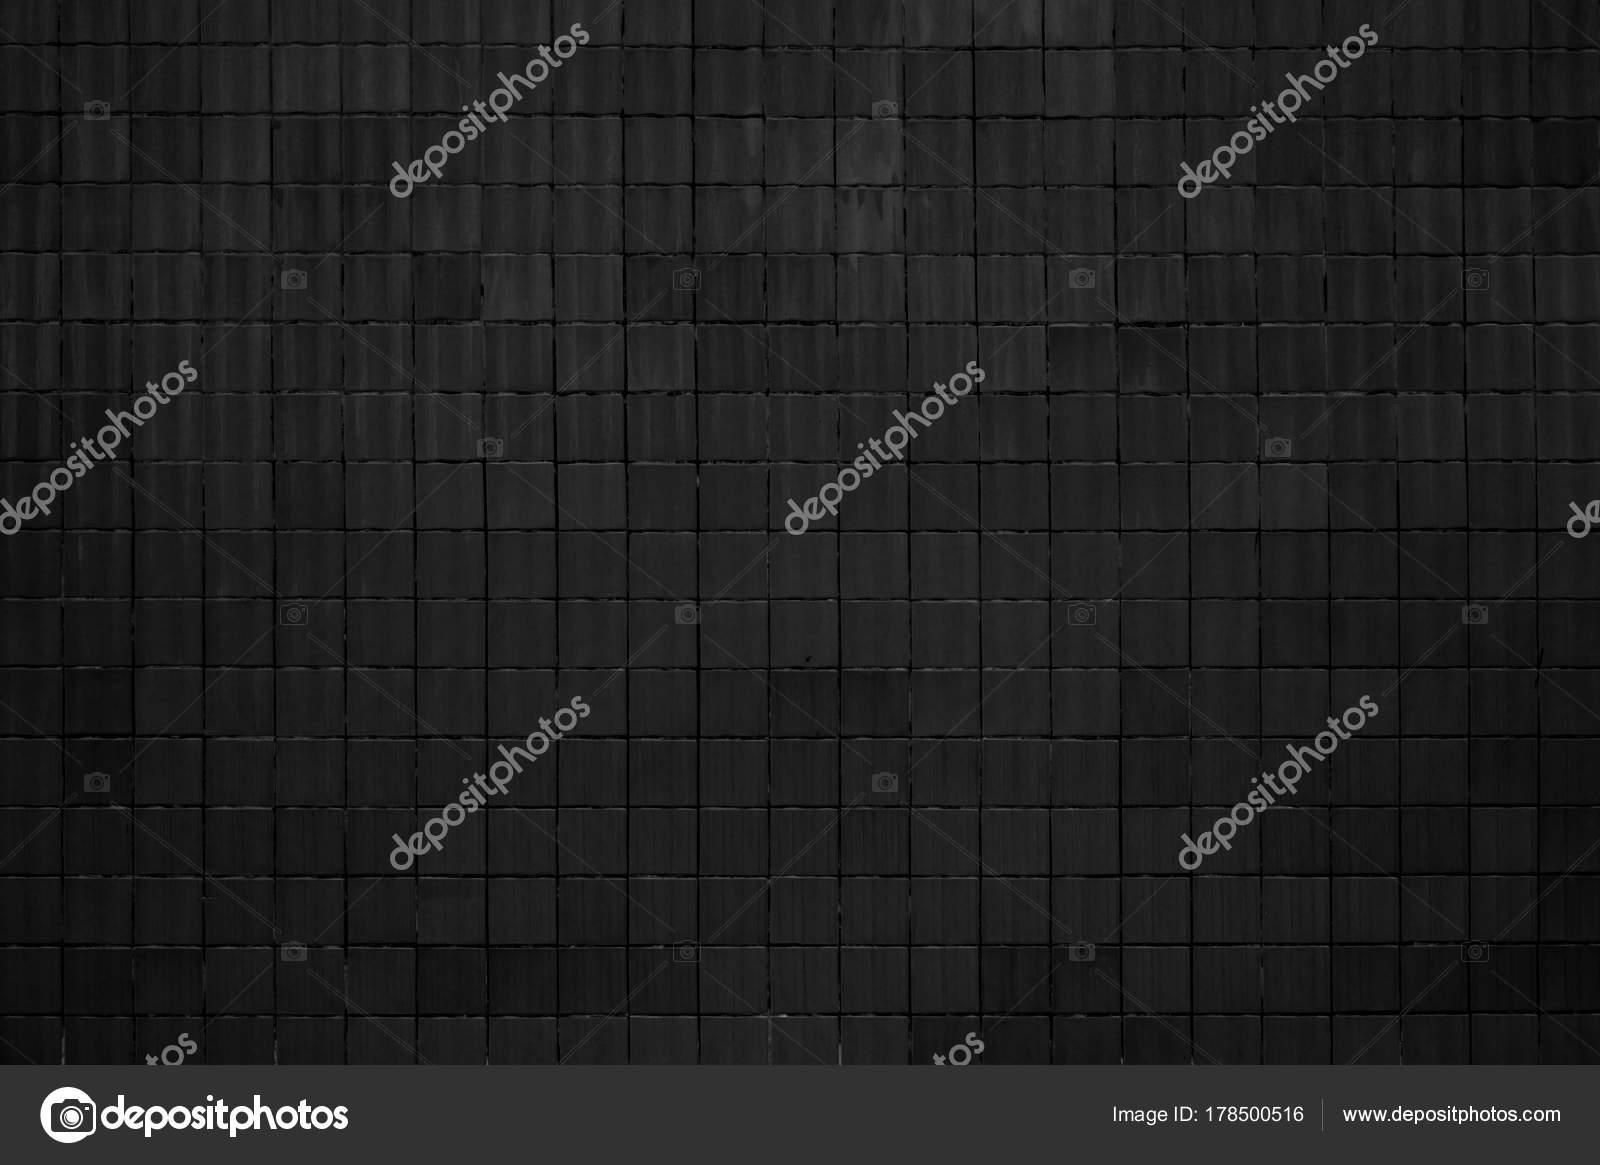 Piastrelle nere scuro u2014 foto stock © keport #178500516